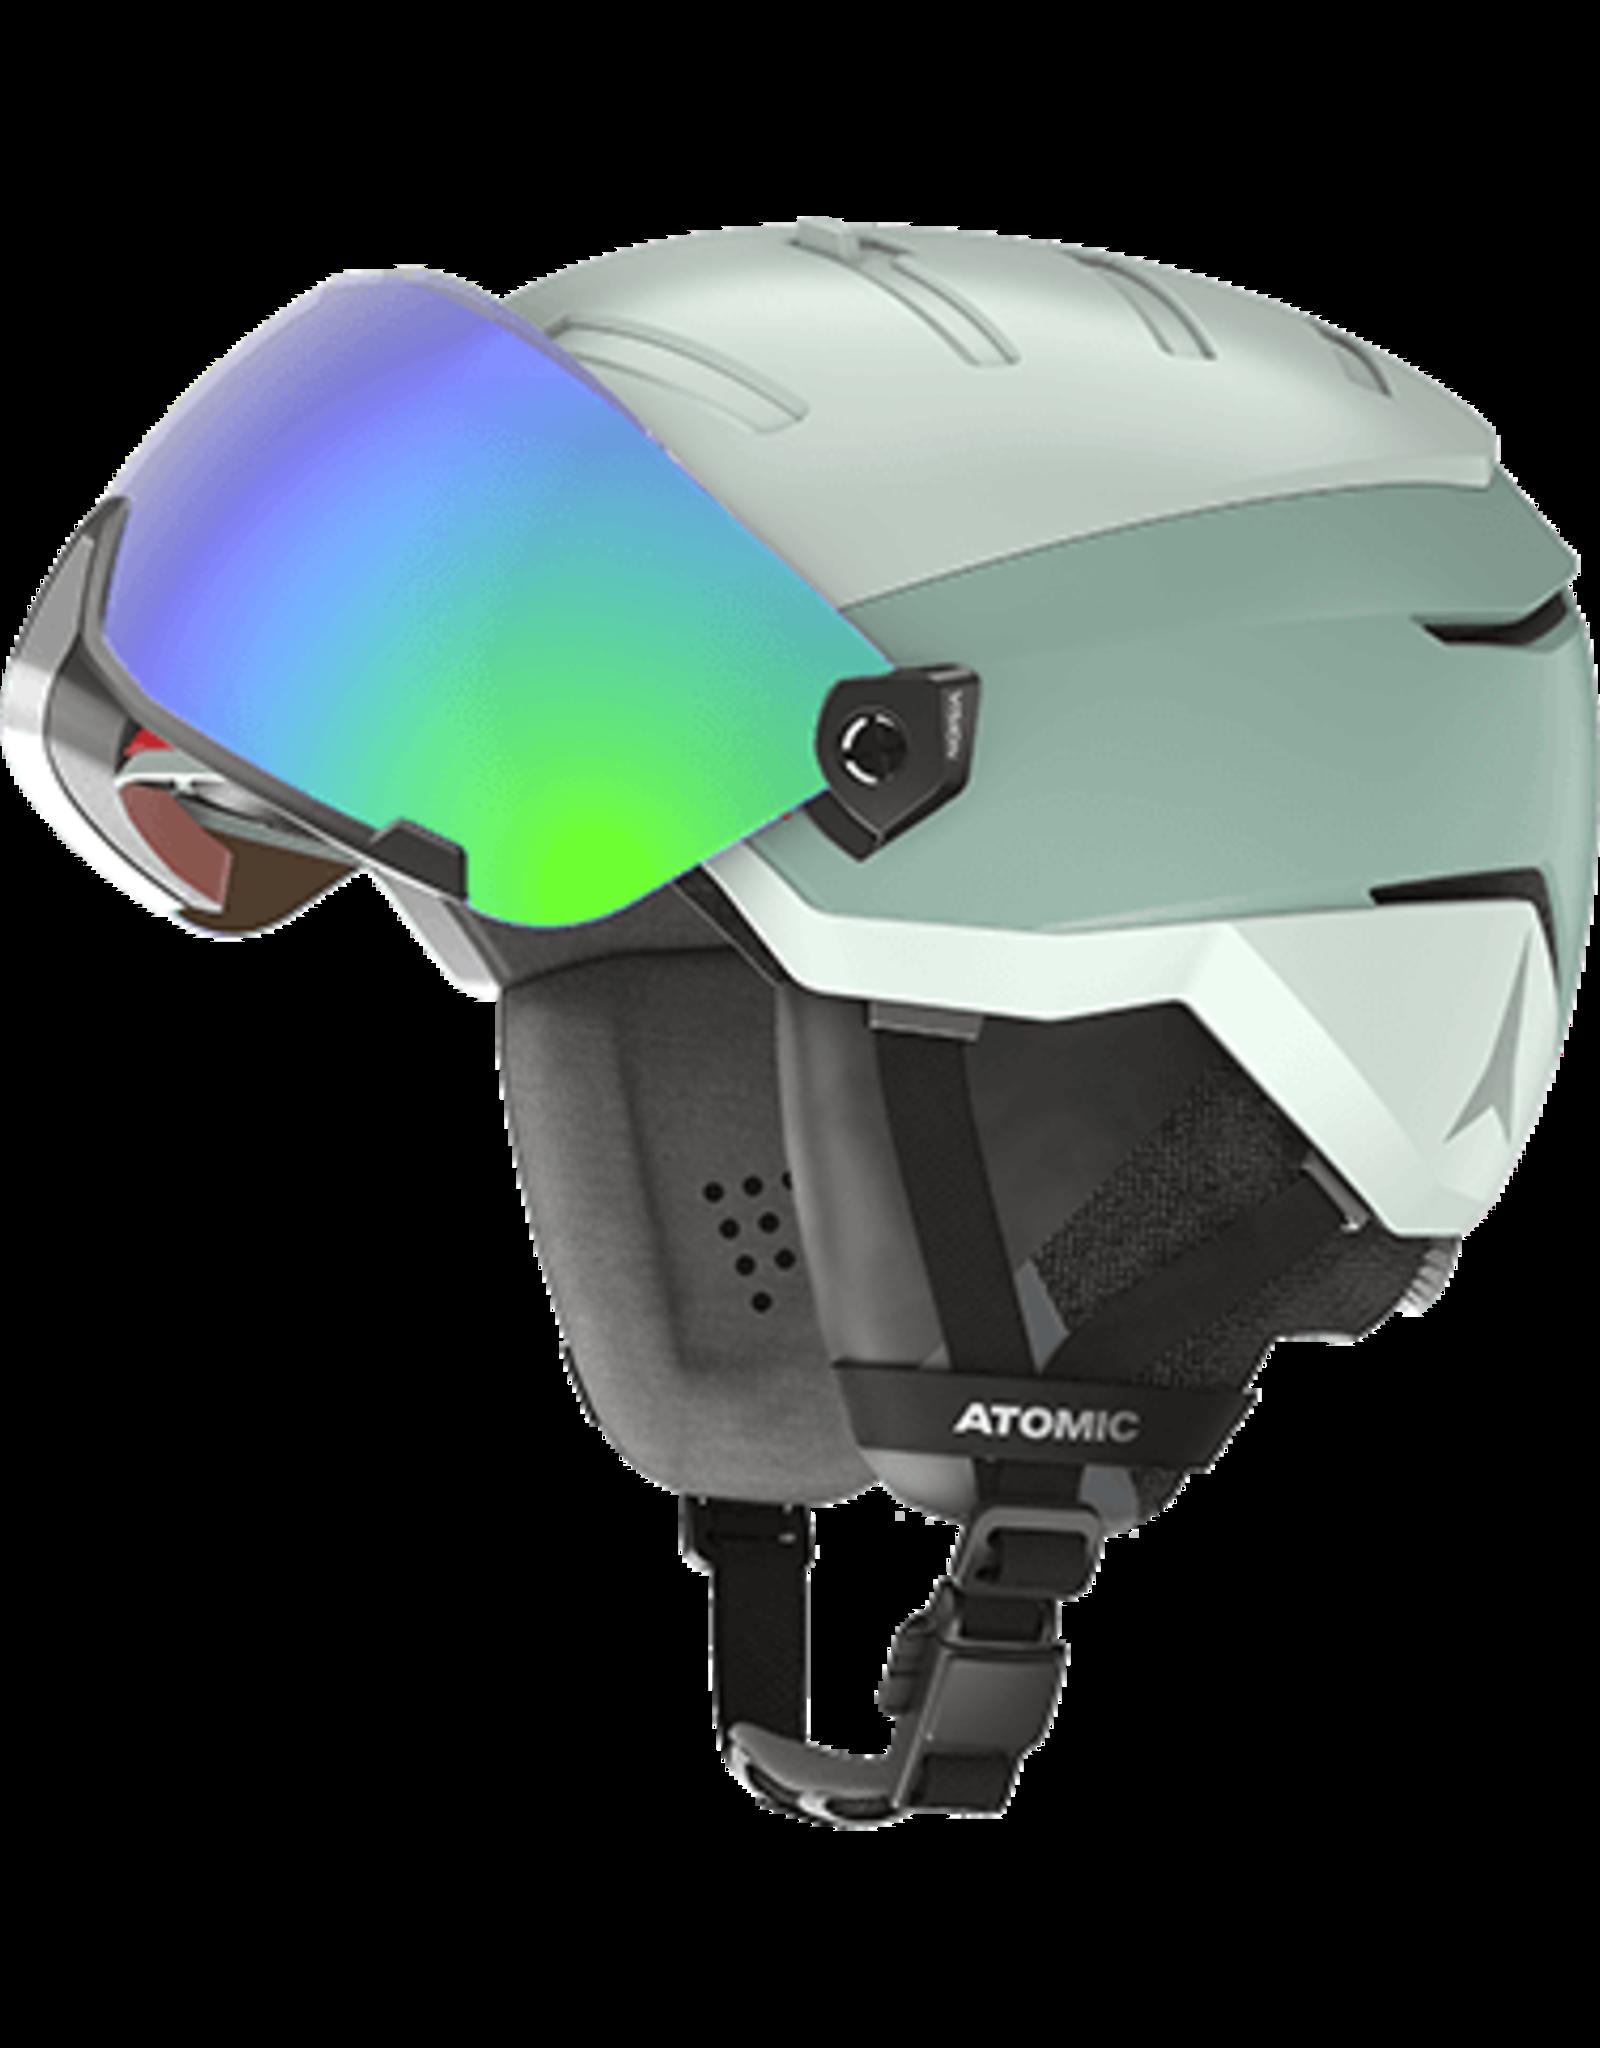 ATOMIC Savor GT AMID Visor HD  Mint